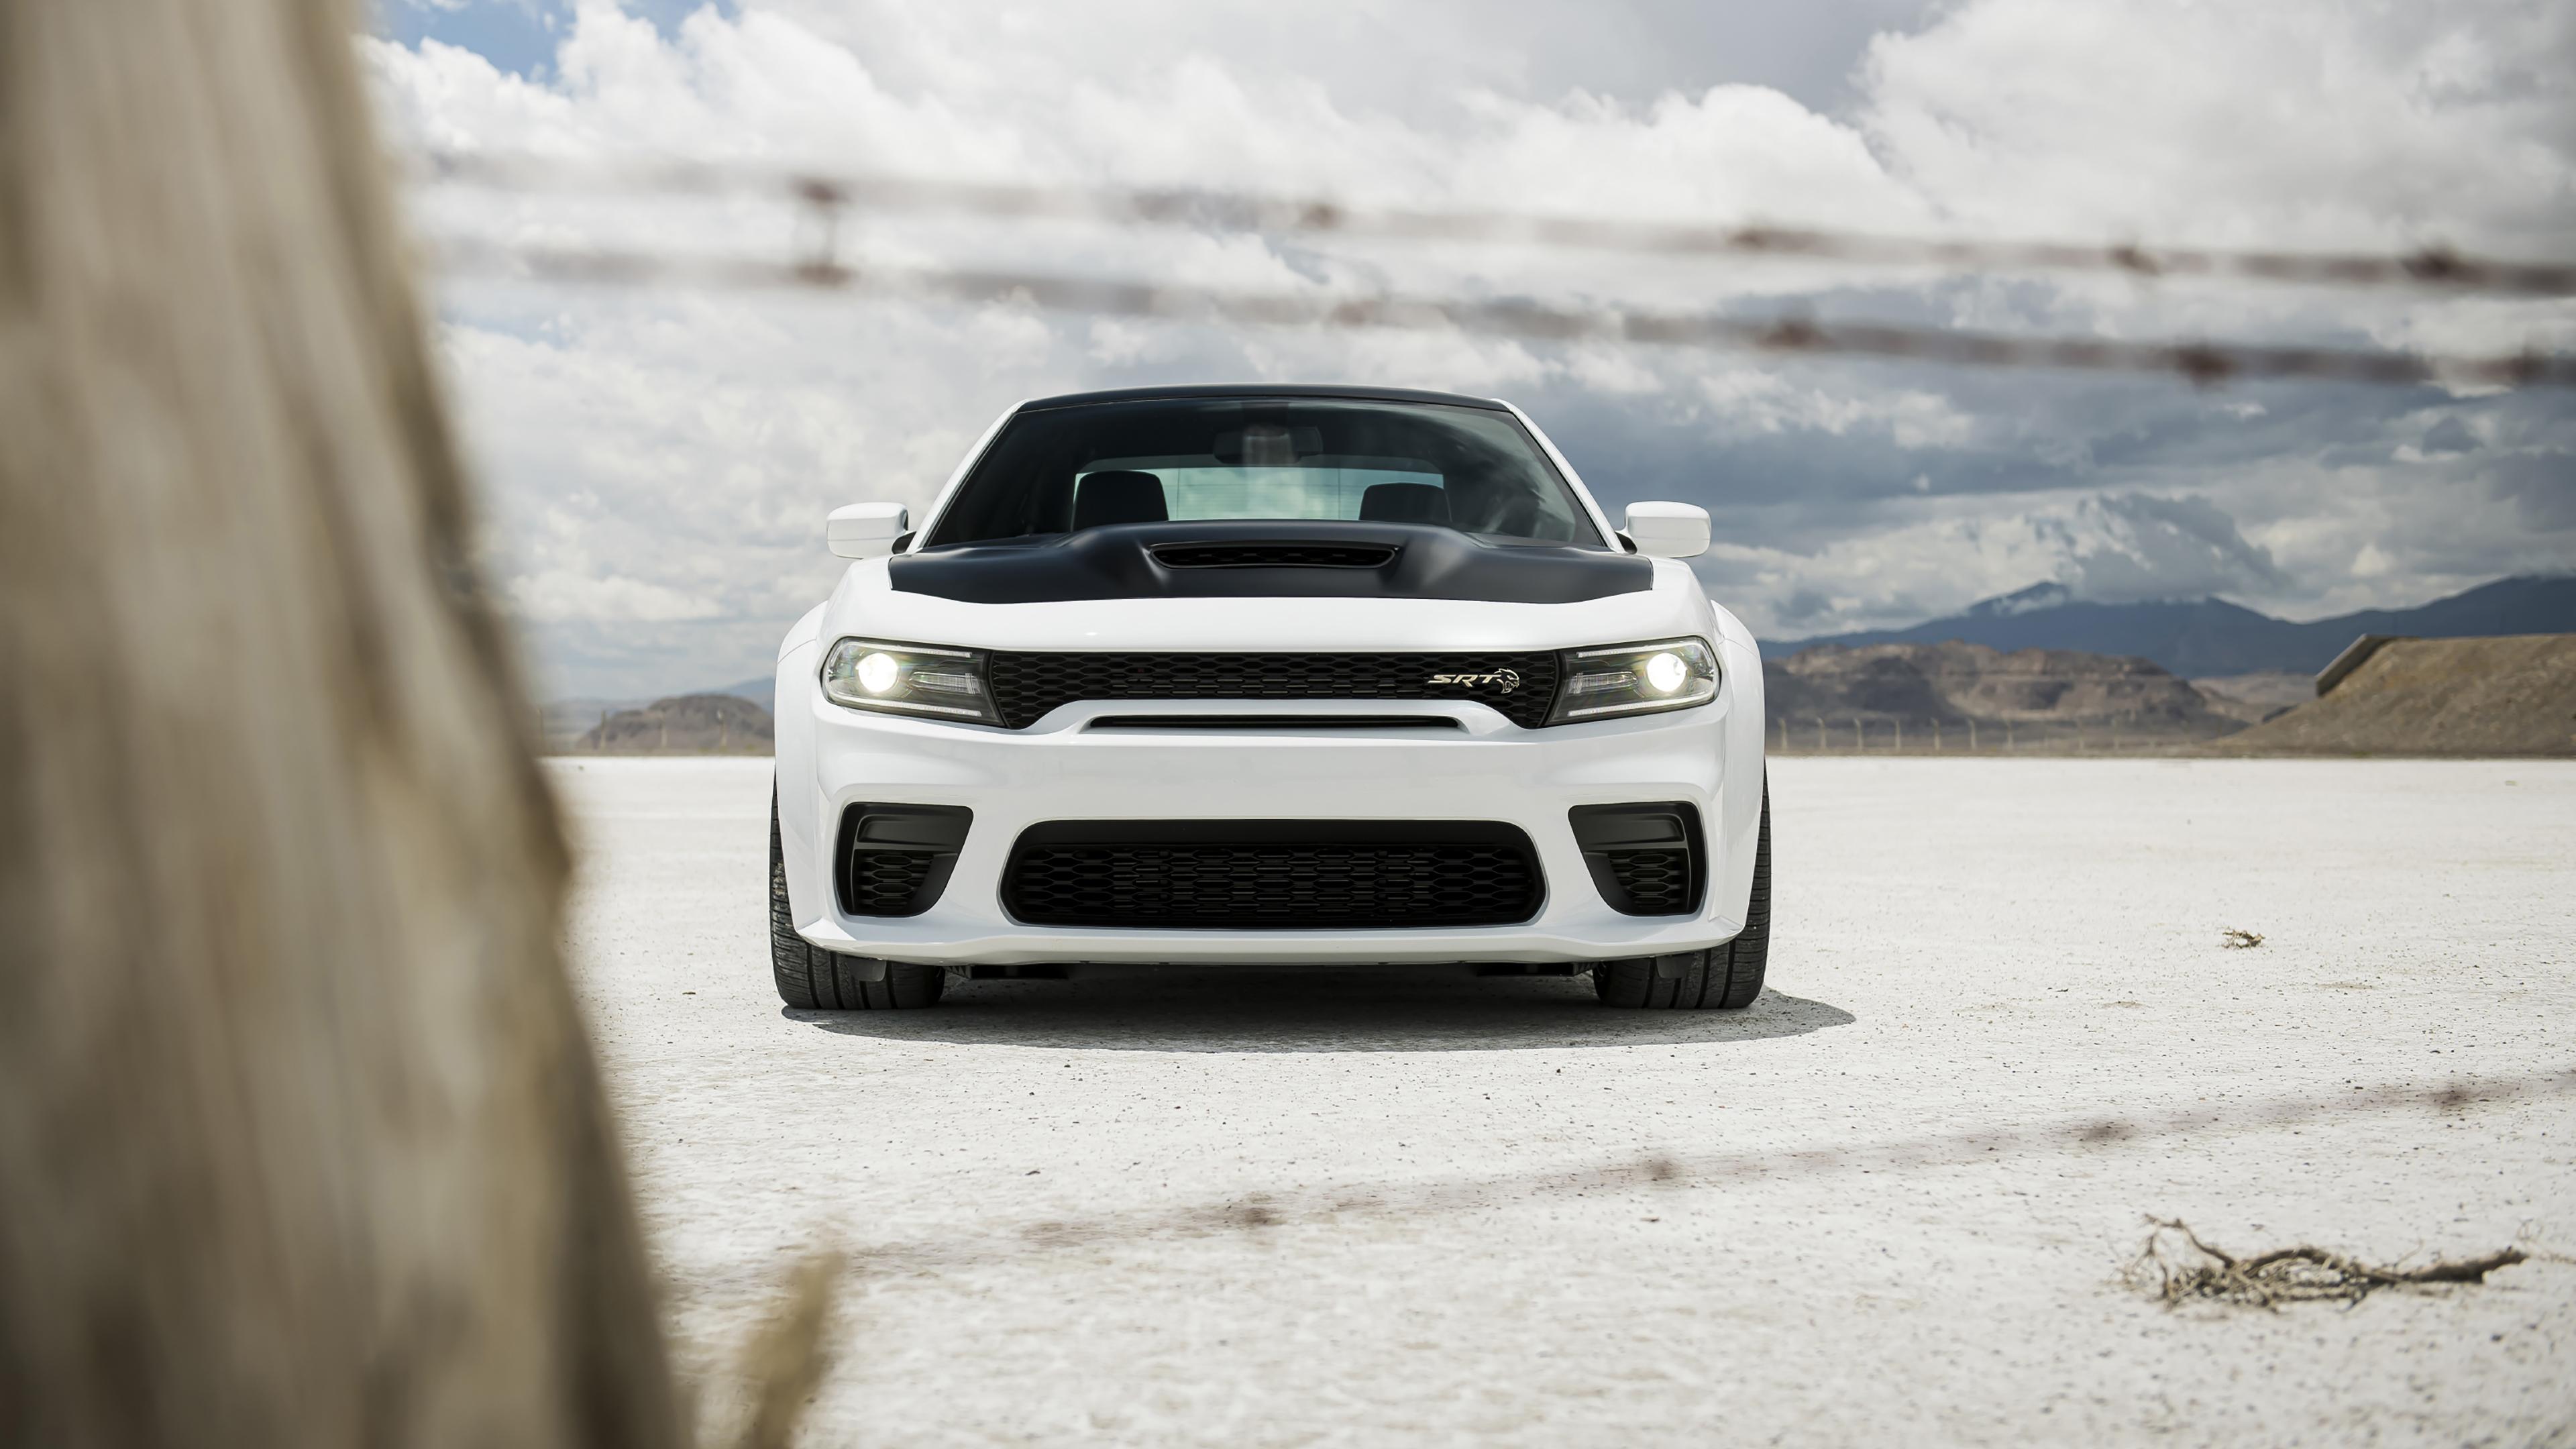 2021 Dodge Charger Srt Hellcat Redeye 4k 3 Wallpaper Hd Car Wallpapers Id 15194